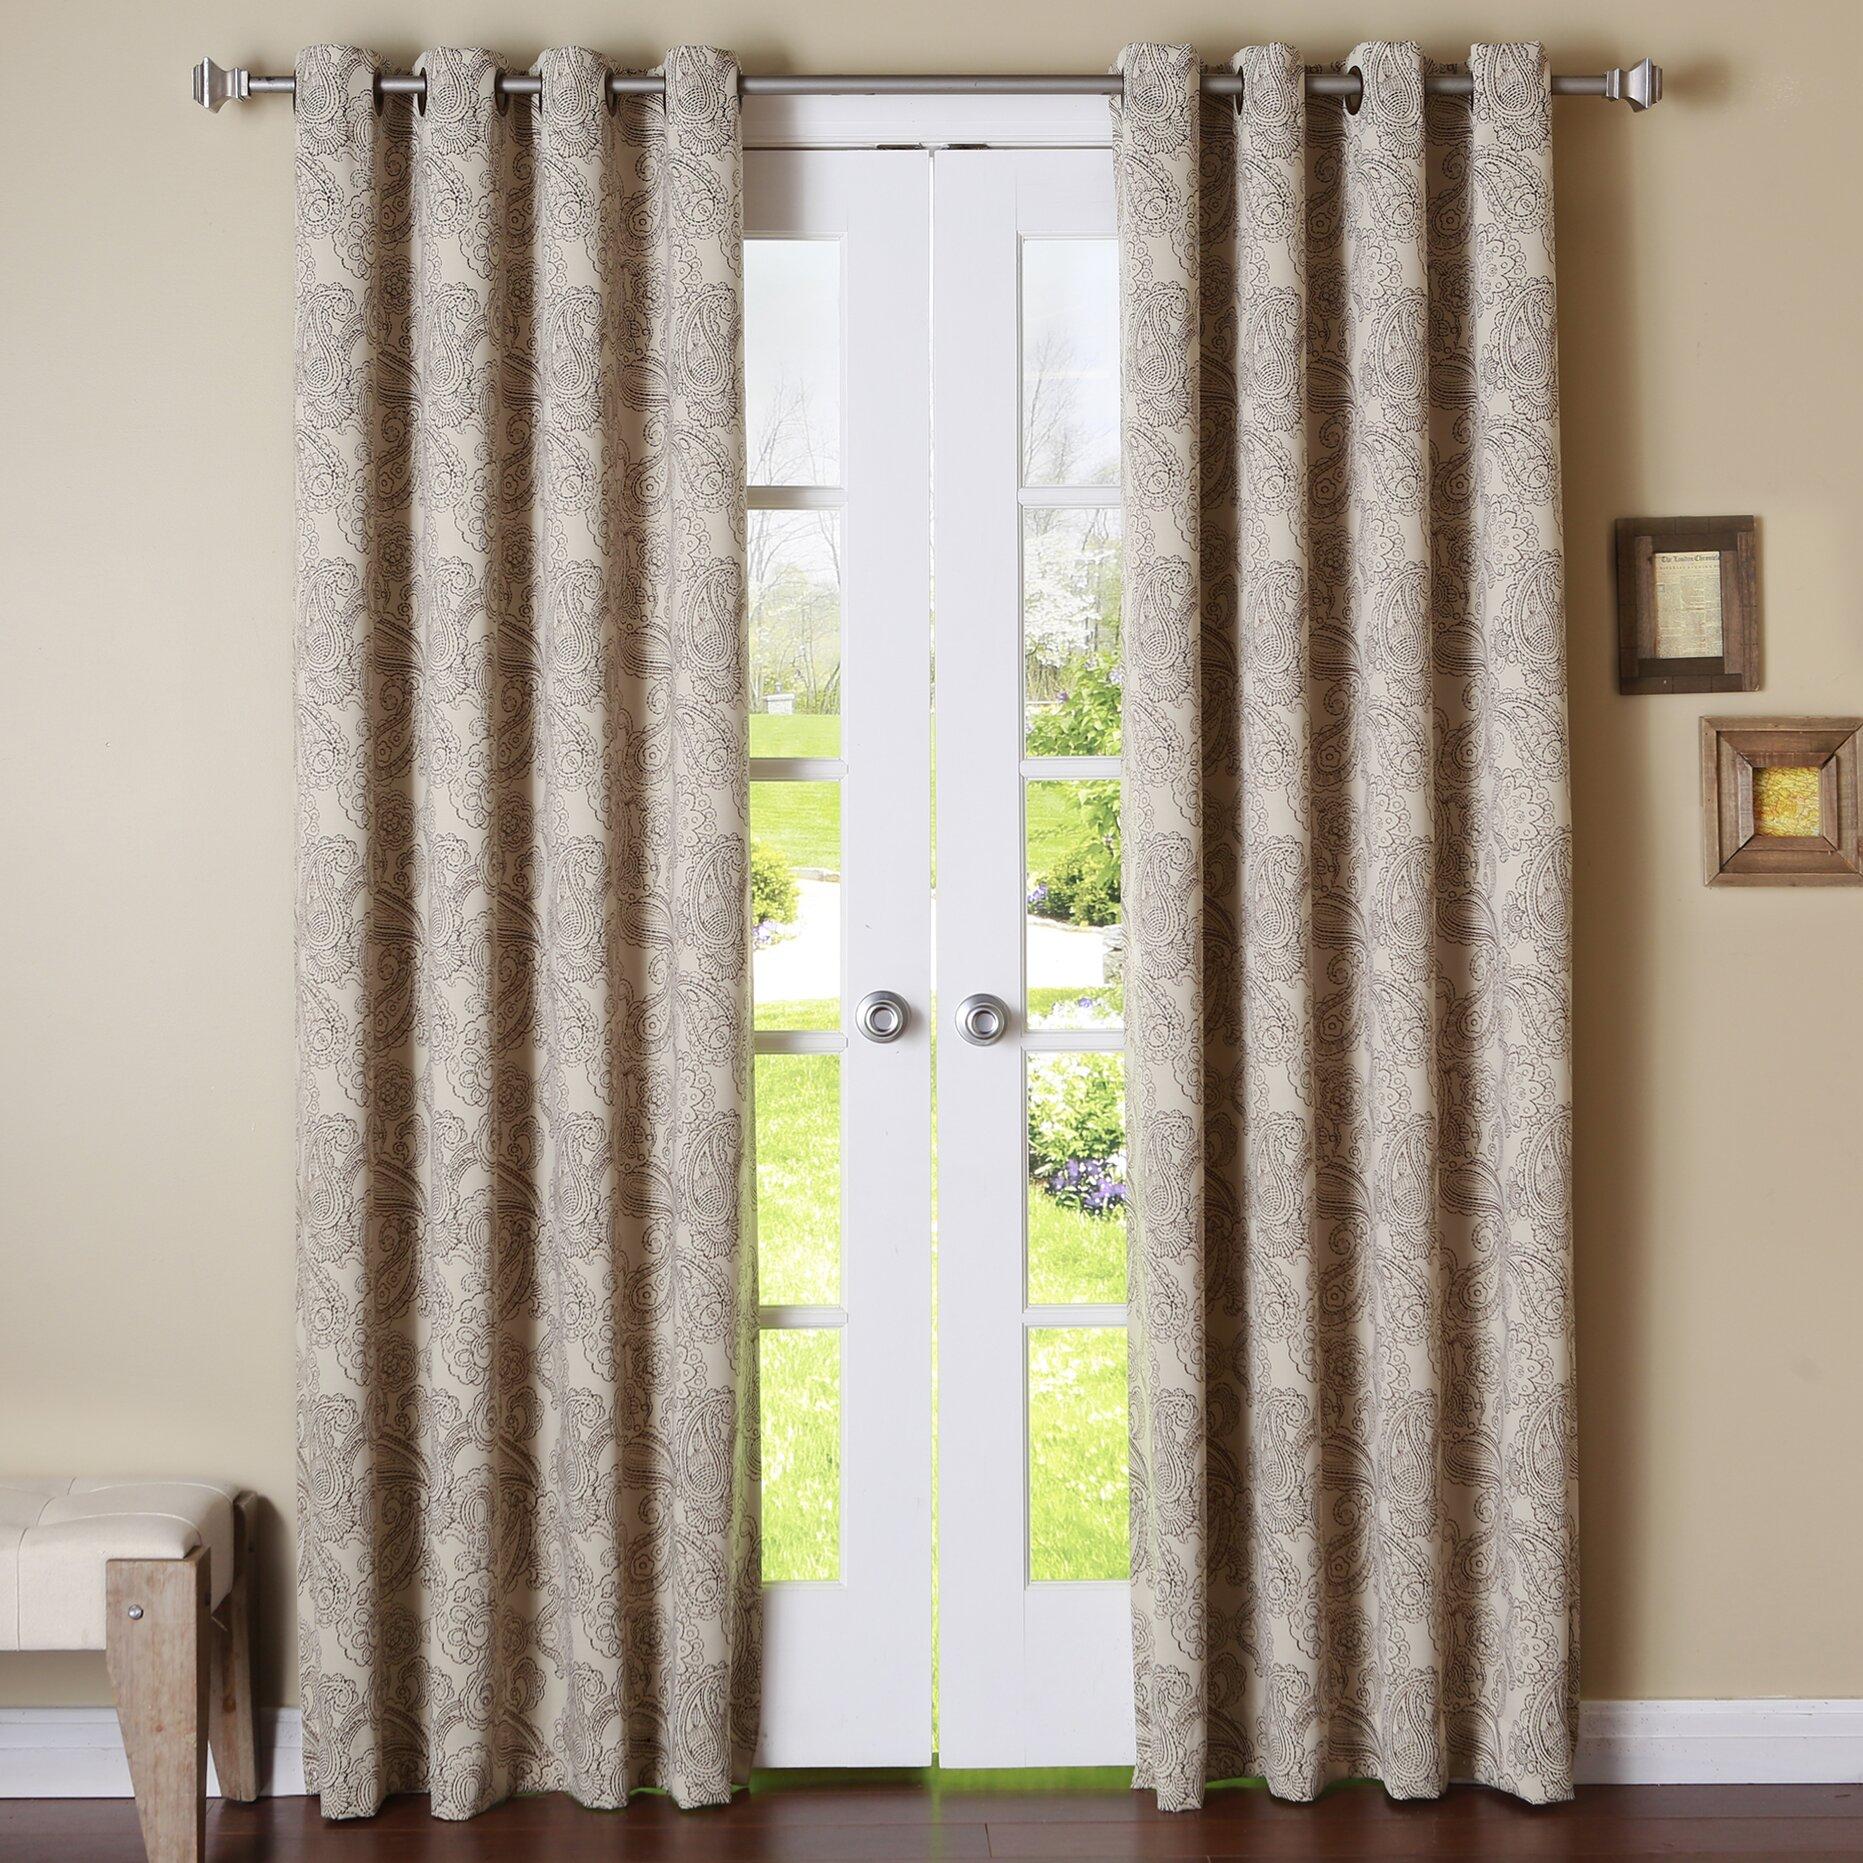 Paisley curtain panels